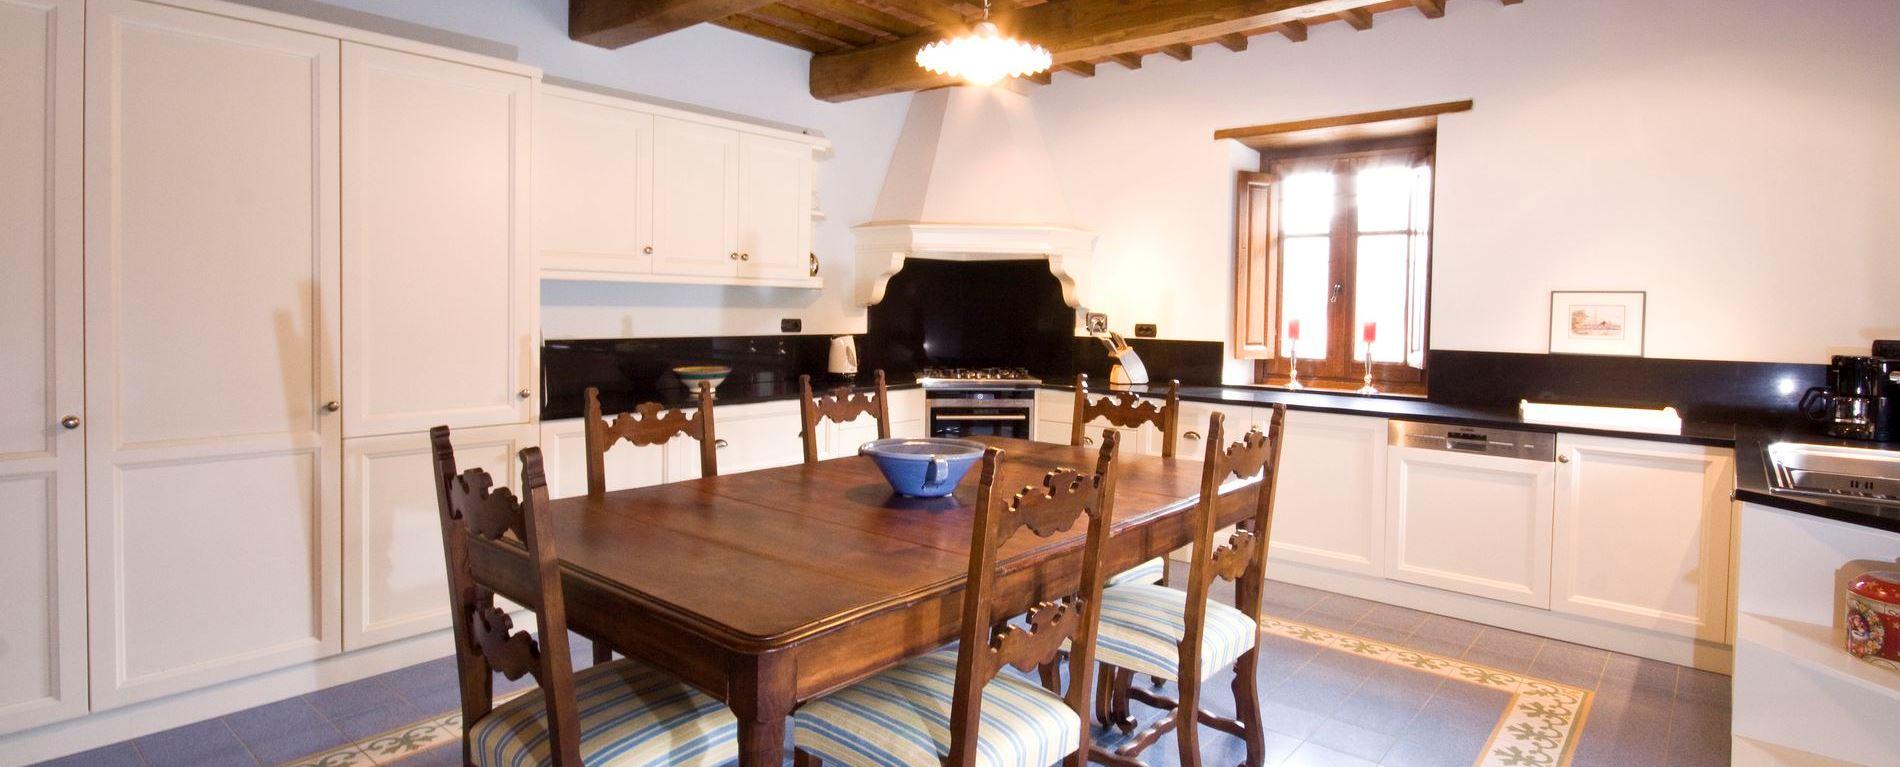 Toscane Poppi Bibbiena - Borgo La Casa vakantiehuizen